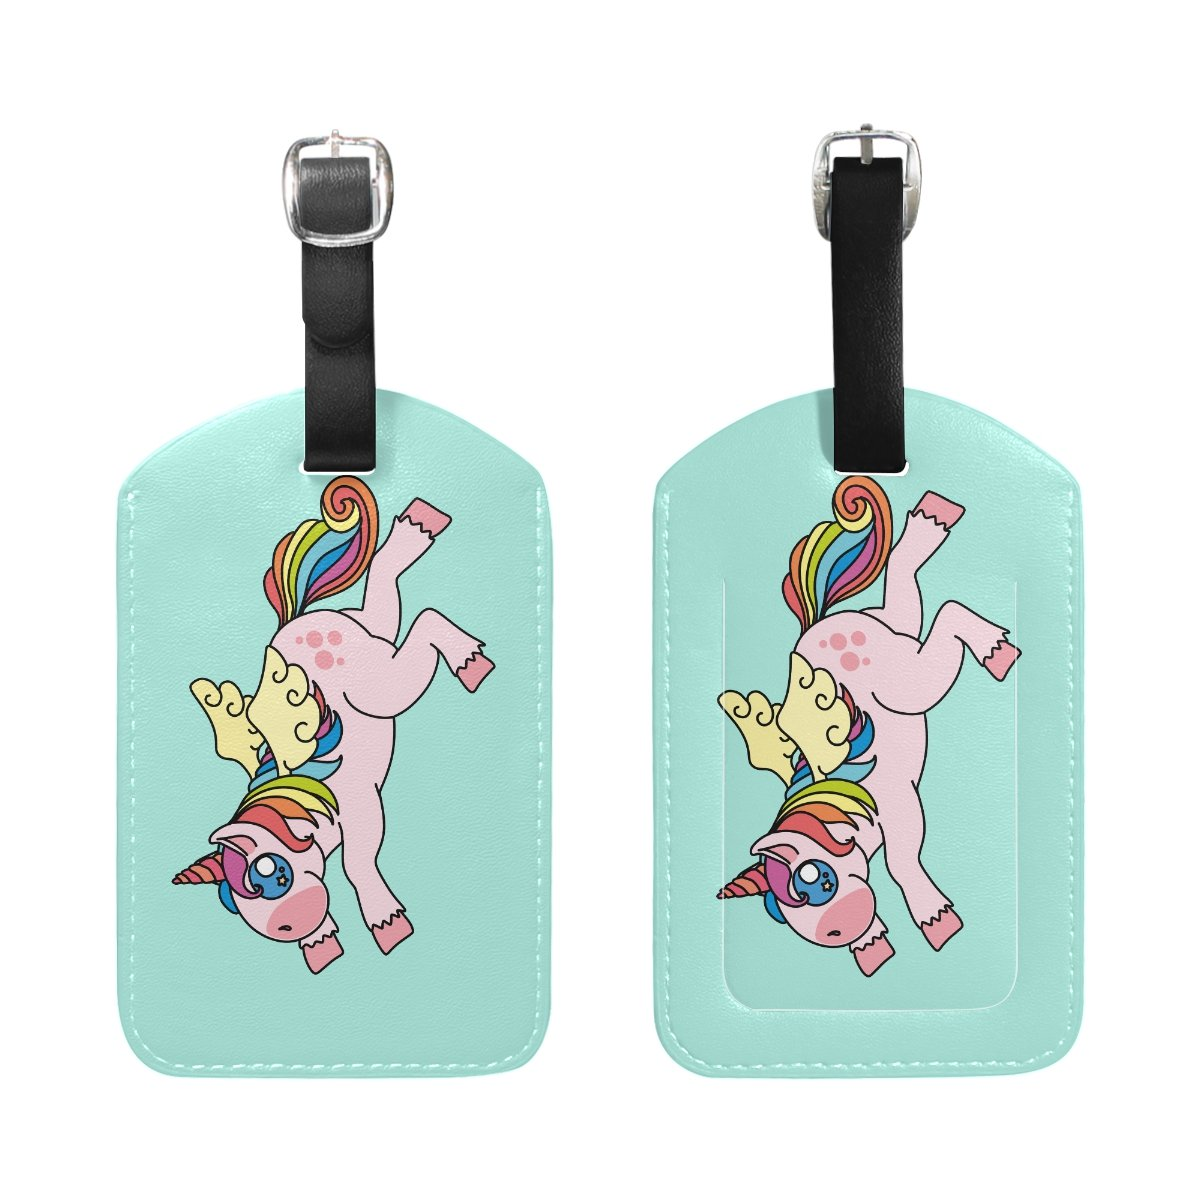 1Pcs Saobao Travel Luggage Tag Colorful Unicorn PU Leather Baggage Suitcase Travel ID Bag Tag